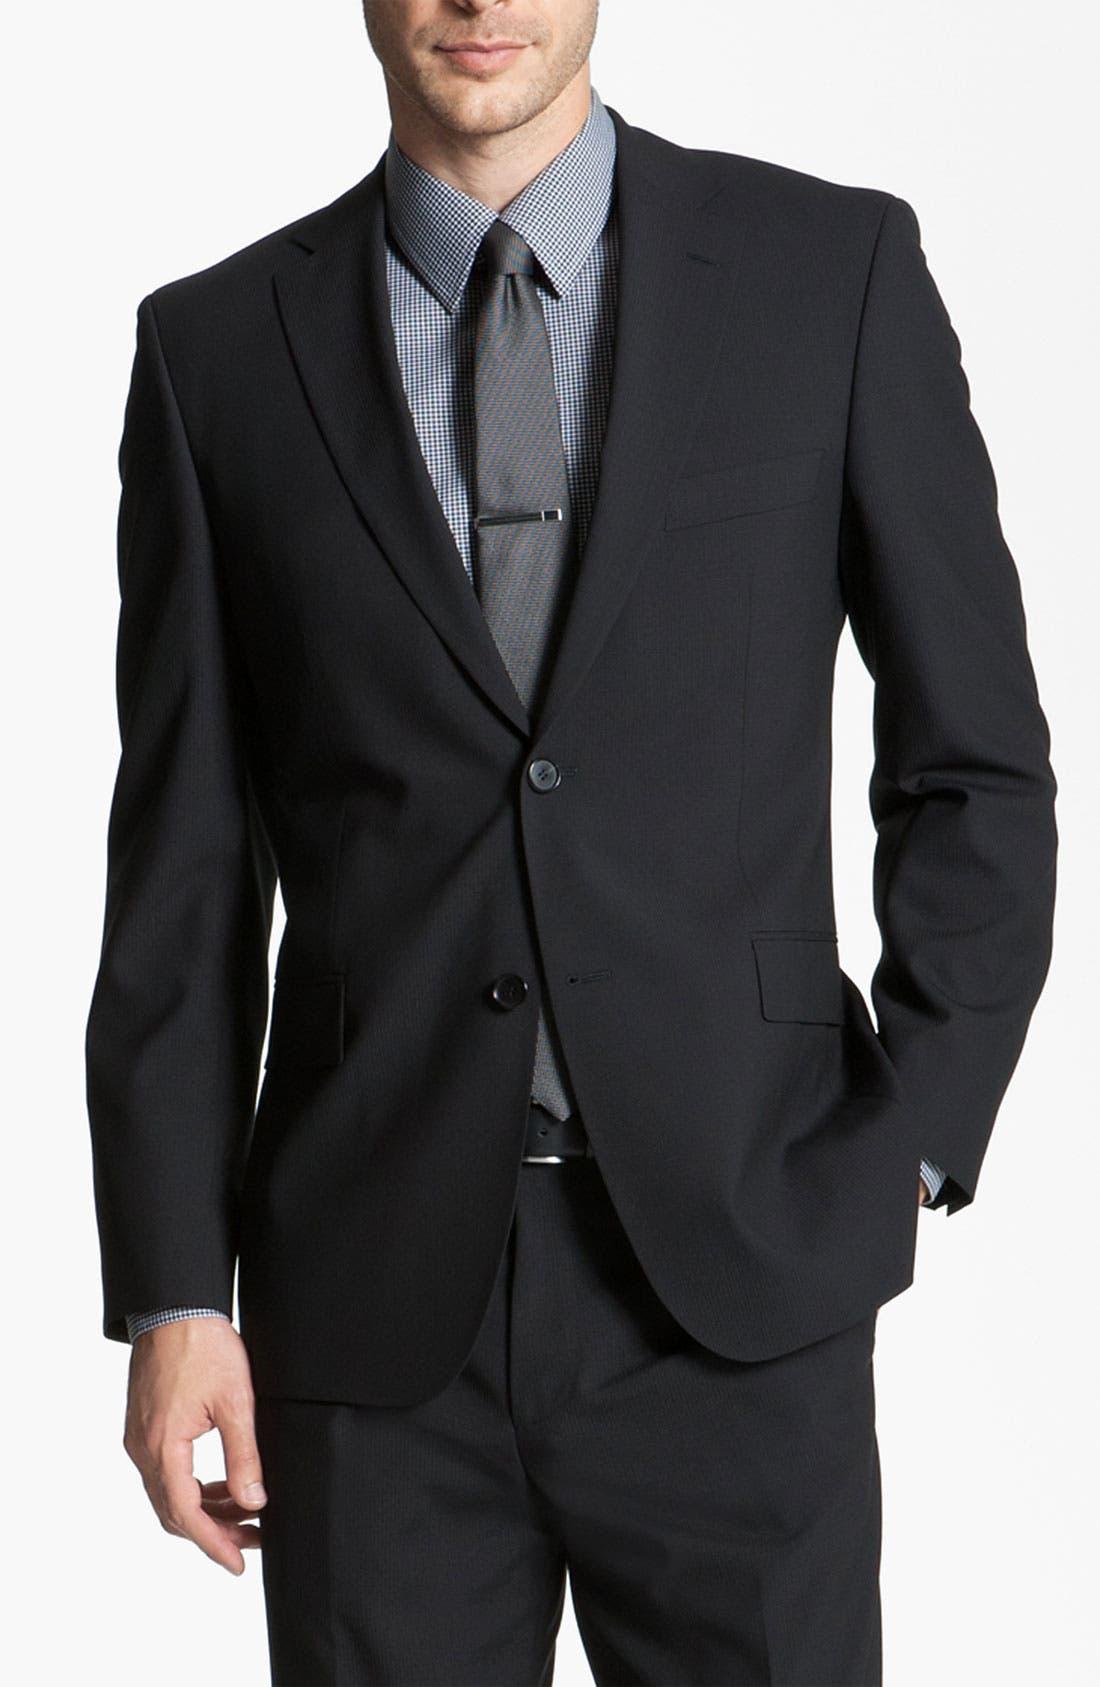 Alternate Image 1 Selected - BOSS Black 'Pasini/Movie' Wool Suit